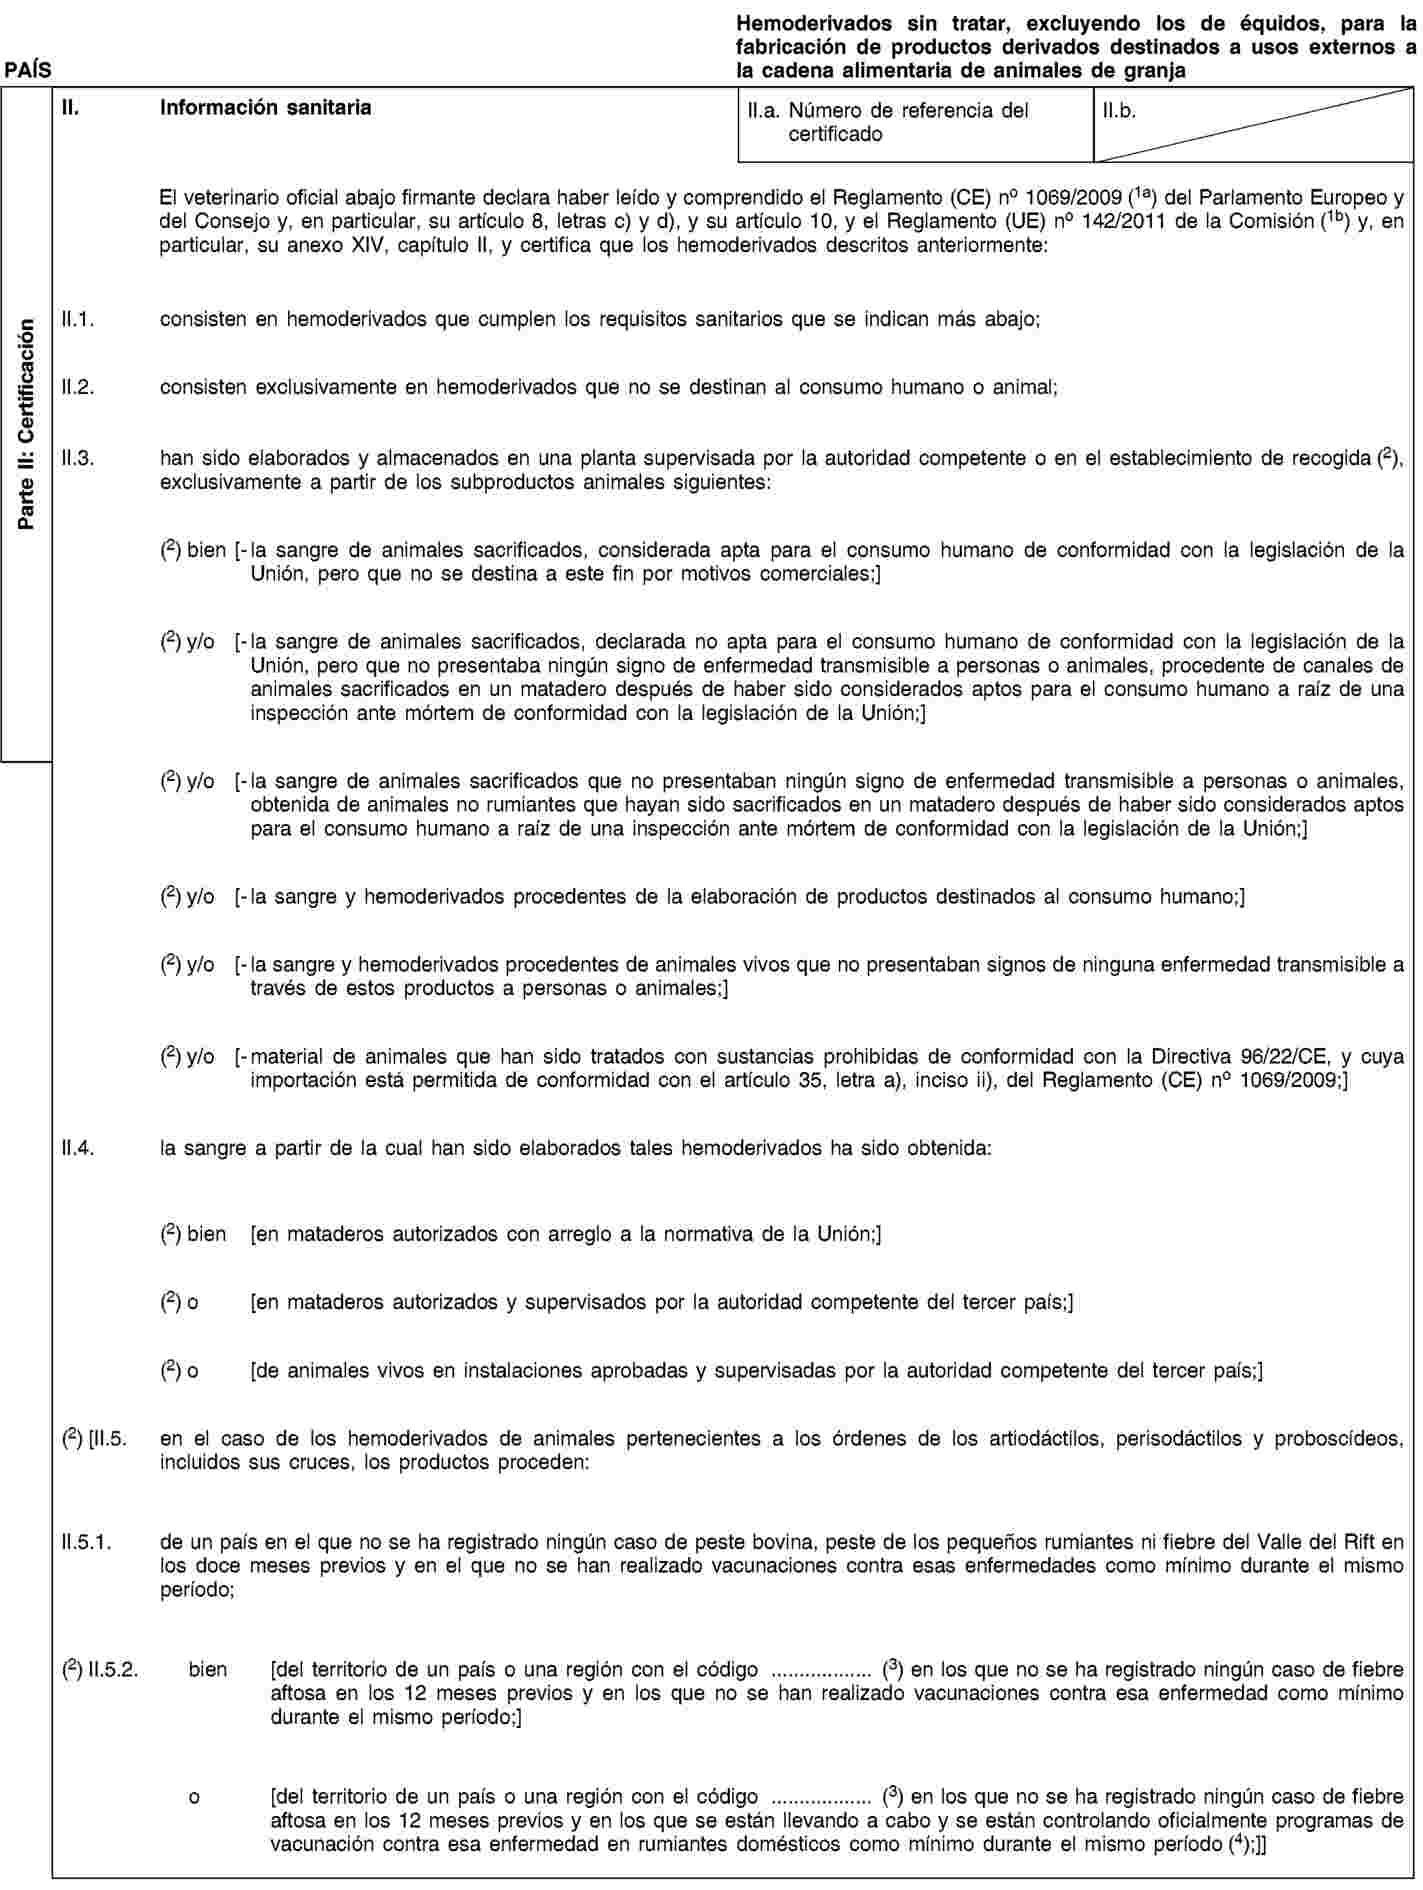 Imagen: https://eur-lex.europa.eu/resource.html?uri=uriserv:OJ.L_.2011.054.01.0001.01.SPA.xhtml.L_2011054ES.01016901.tif.jpg